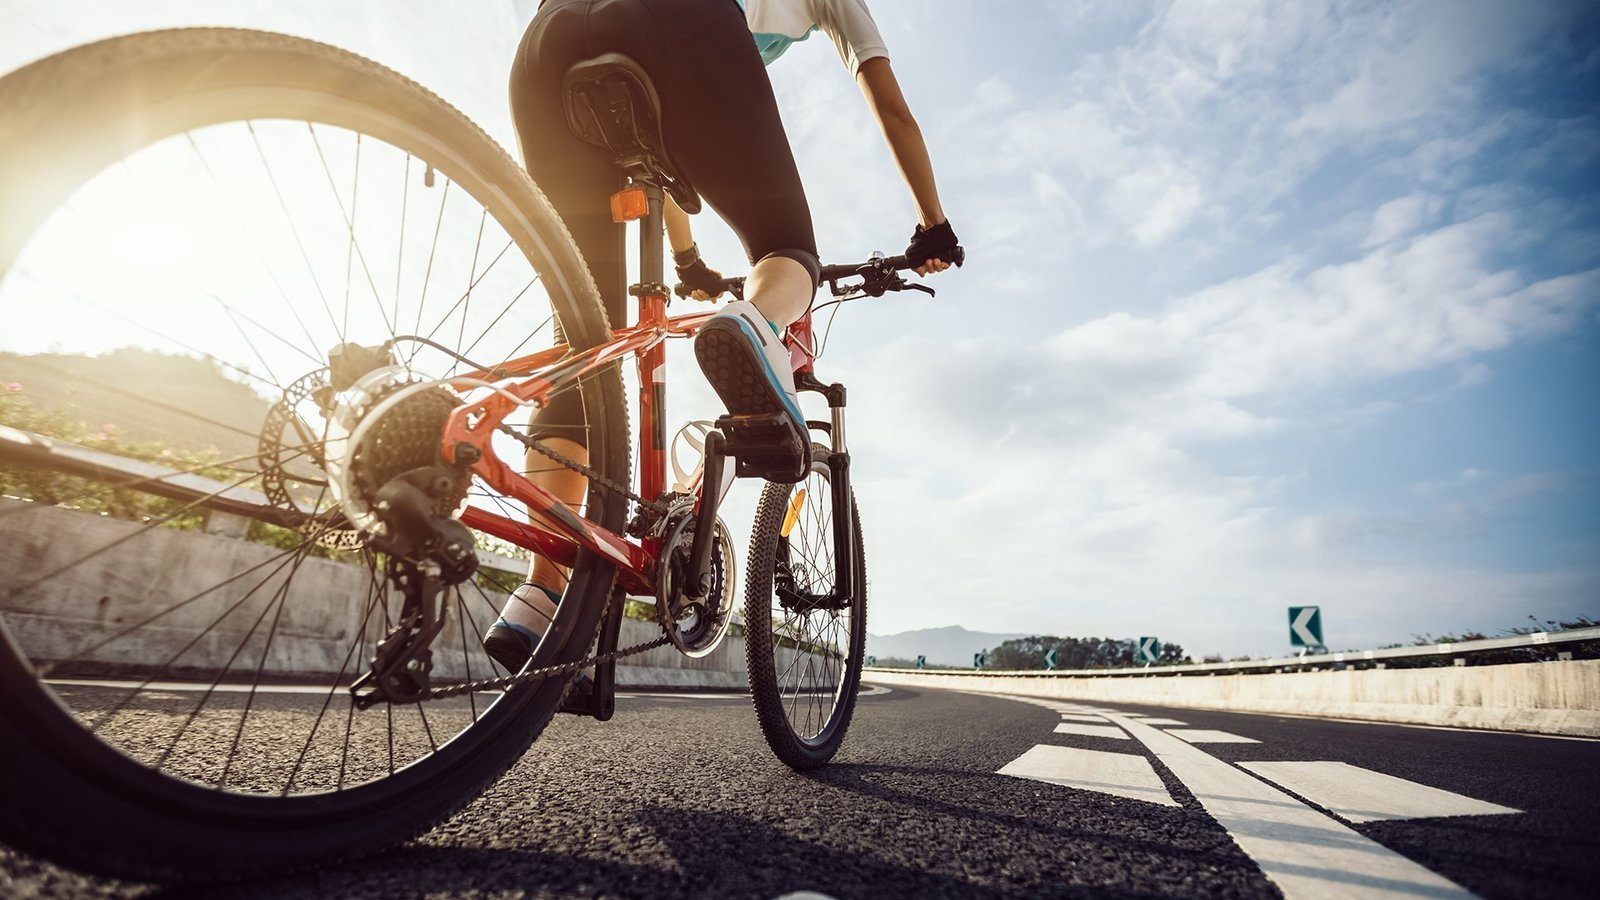 A man enjoys cycling